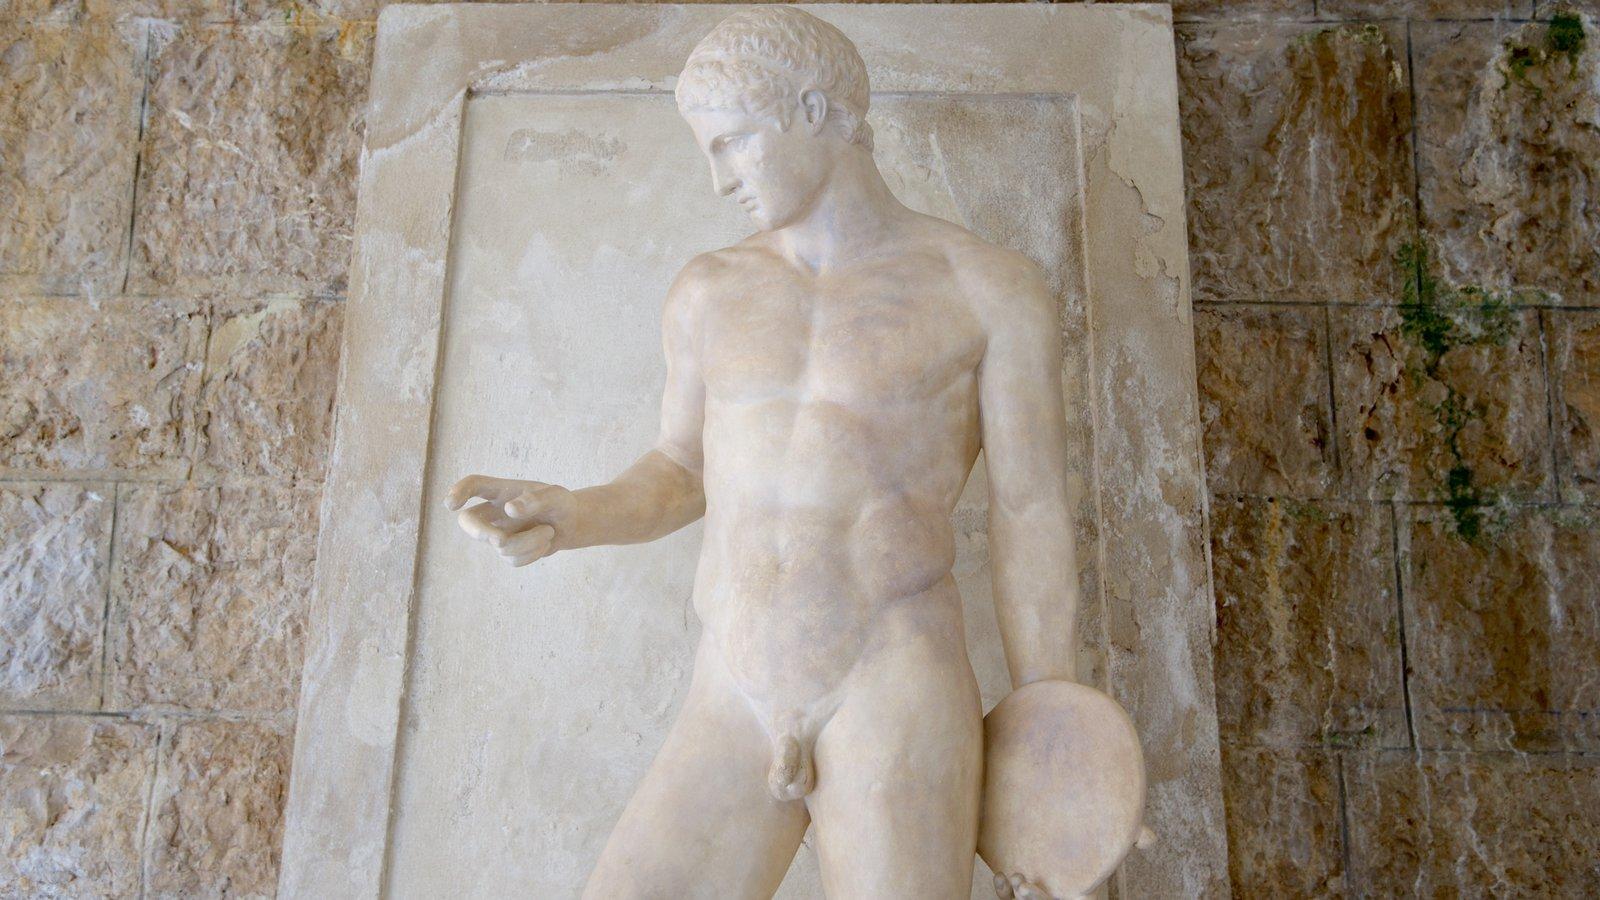 Villa Kerylos mostrando uma estátua ou escultura